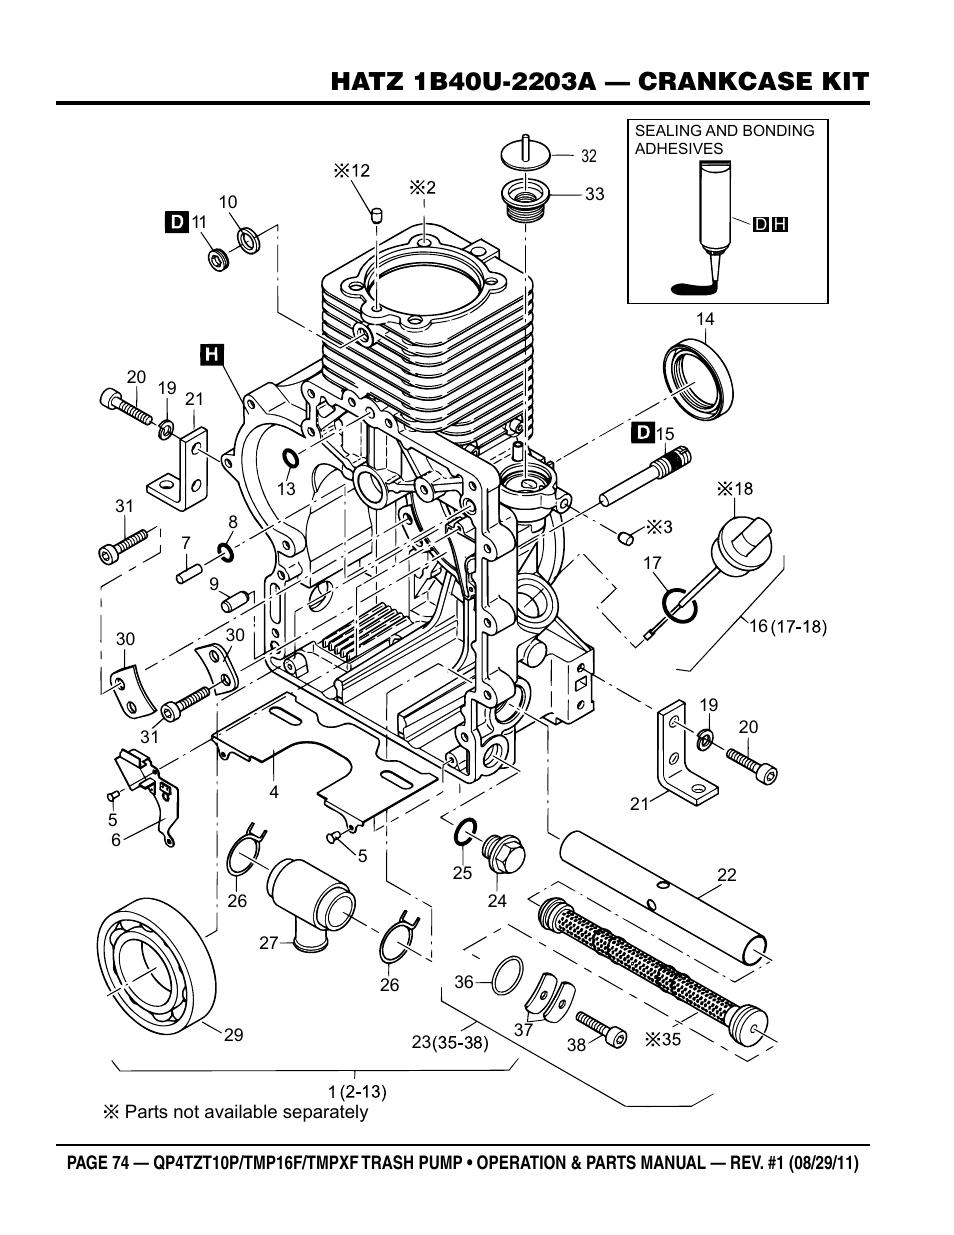 Multiquip TRASH PUMP (hatz 1B40u-2203a diesel engine